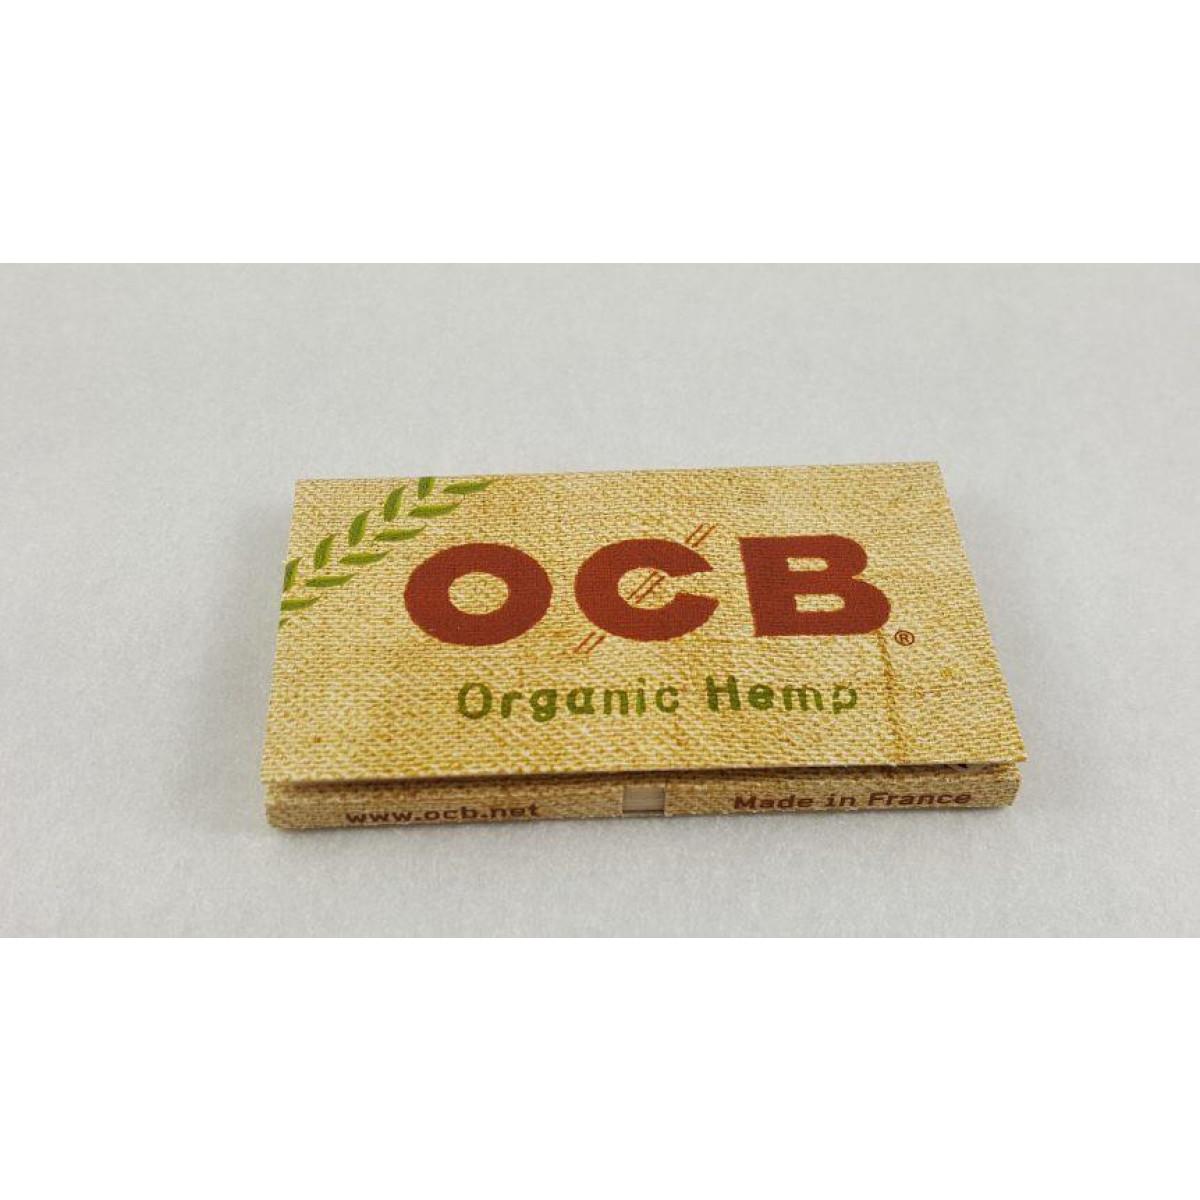 OCB ORGANIC SINGLE WIDE ROLLING PAPERS